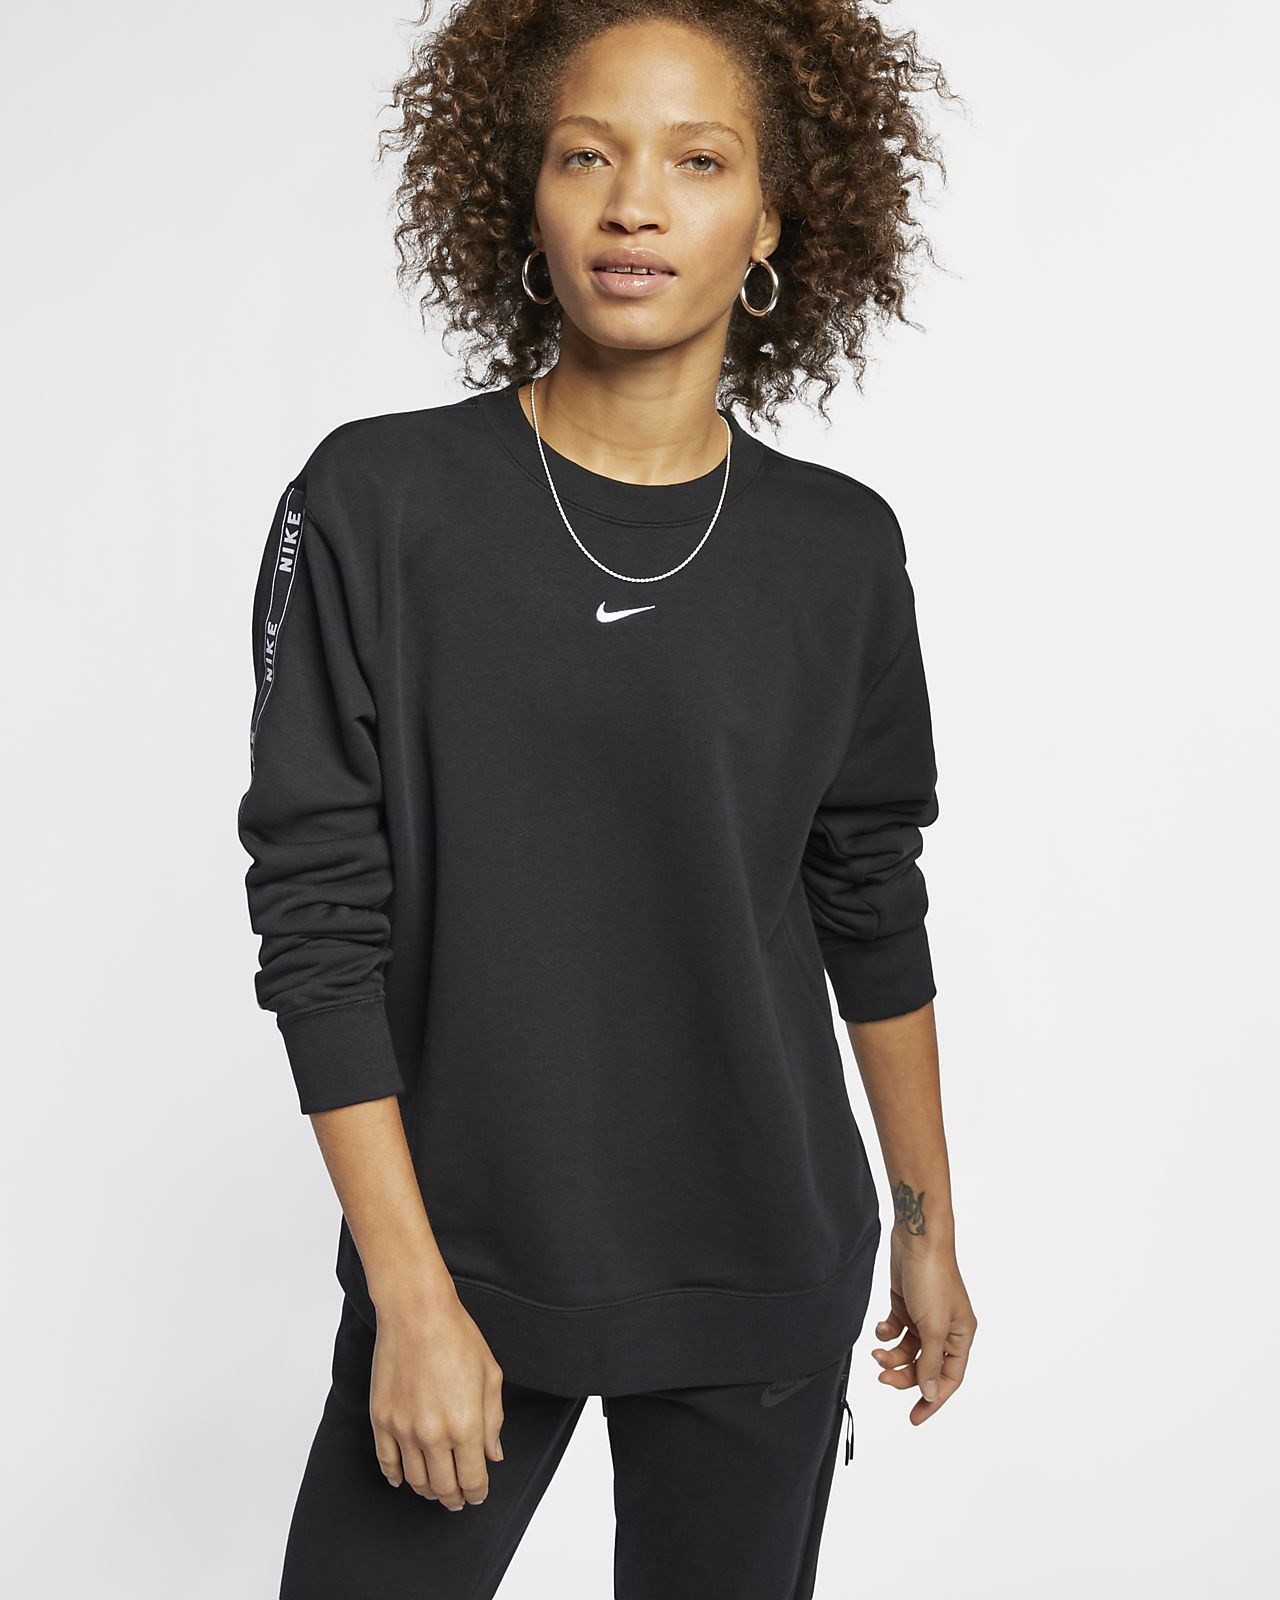 Helt nye Nike Sportswear Logo Crew. Nike.com DK HD-17